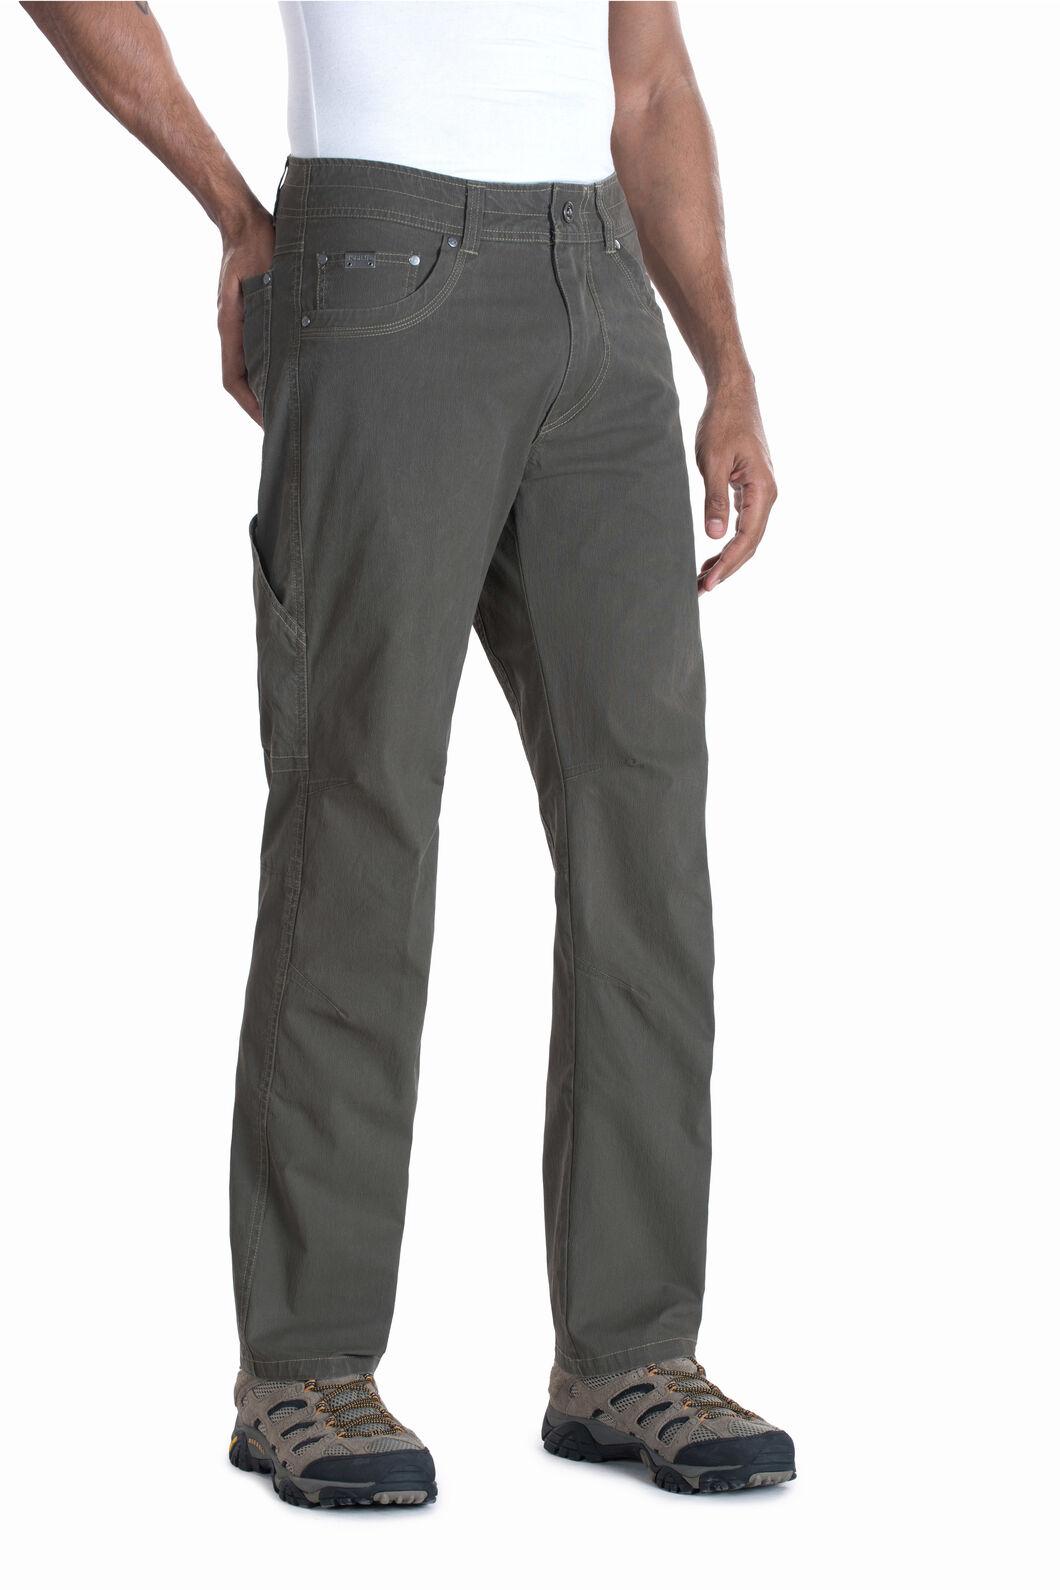 Kuhl Revolvr Pants (32 inch) - Men's, Gunmetal, hi-res